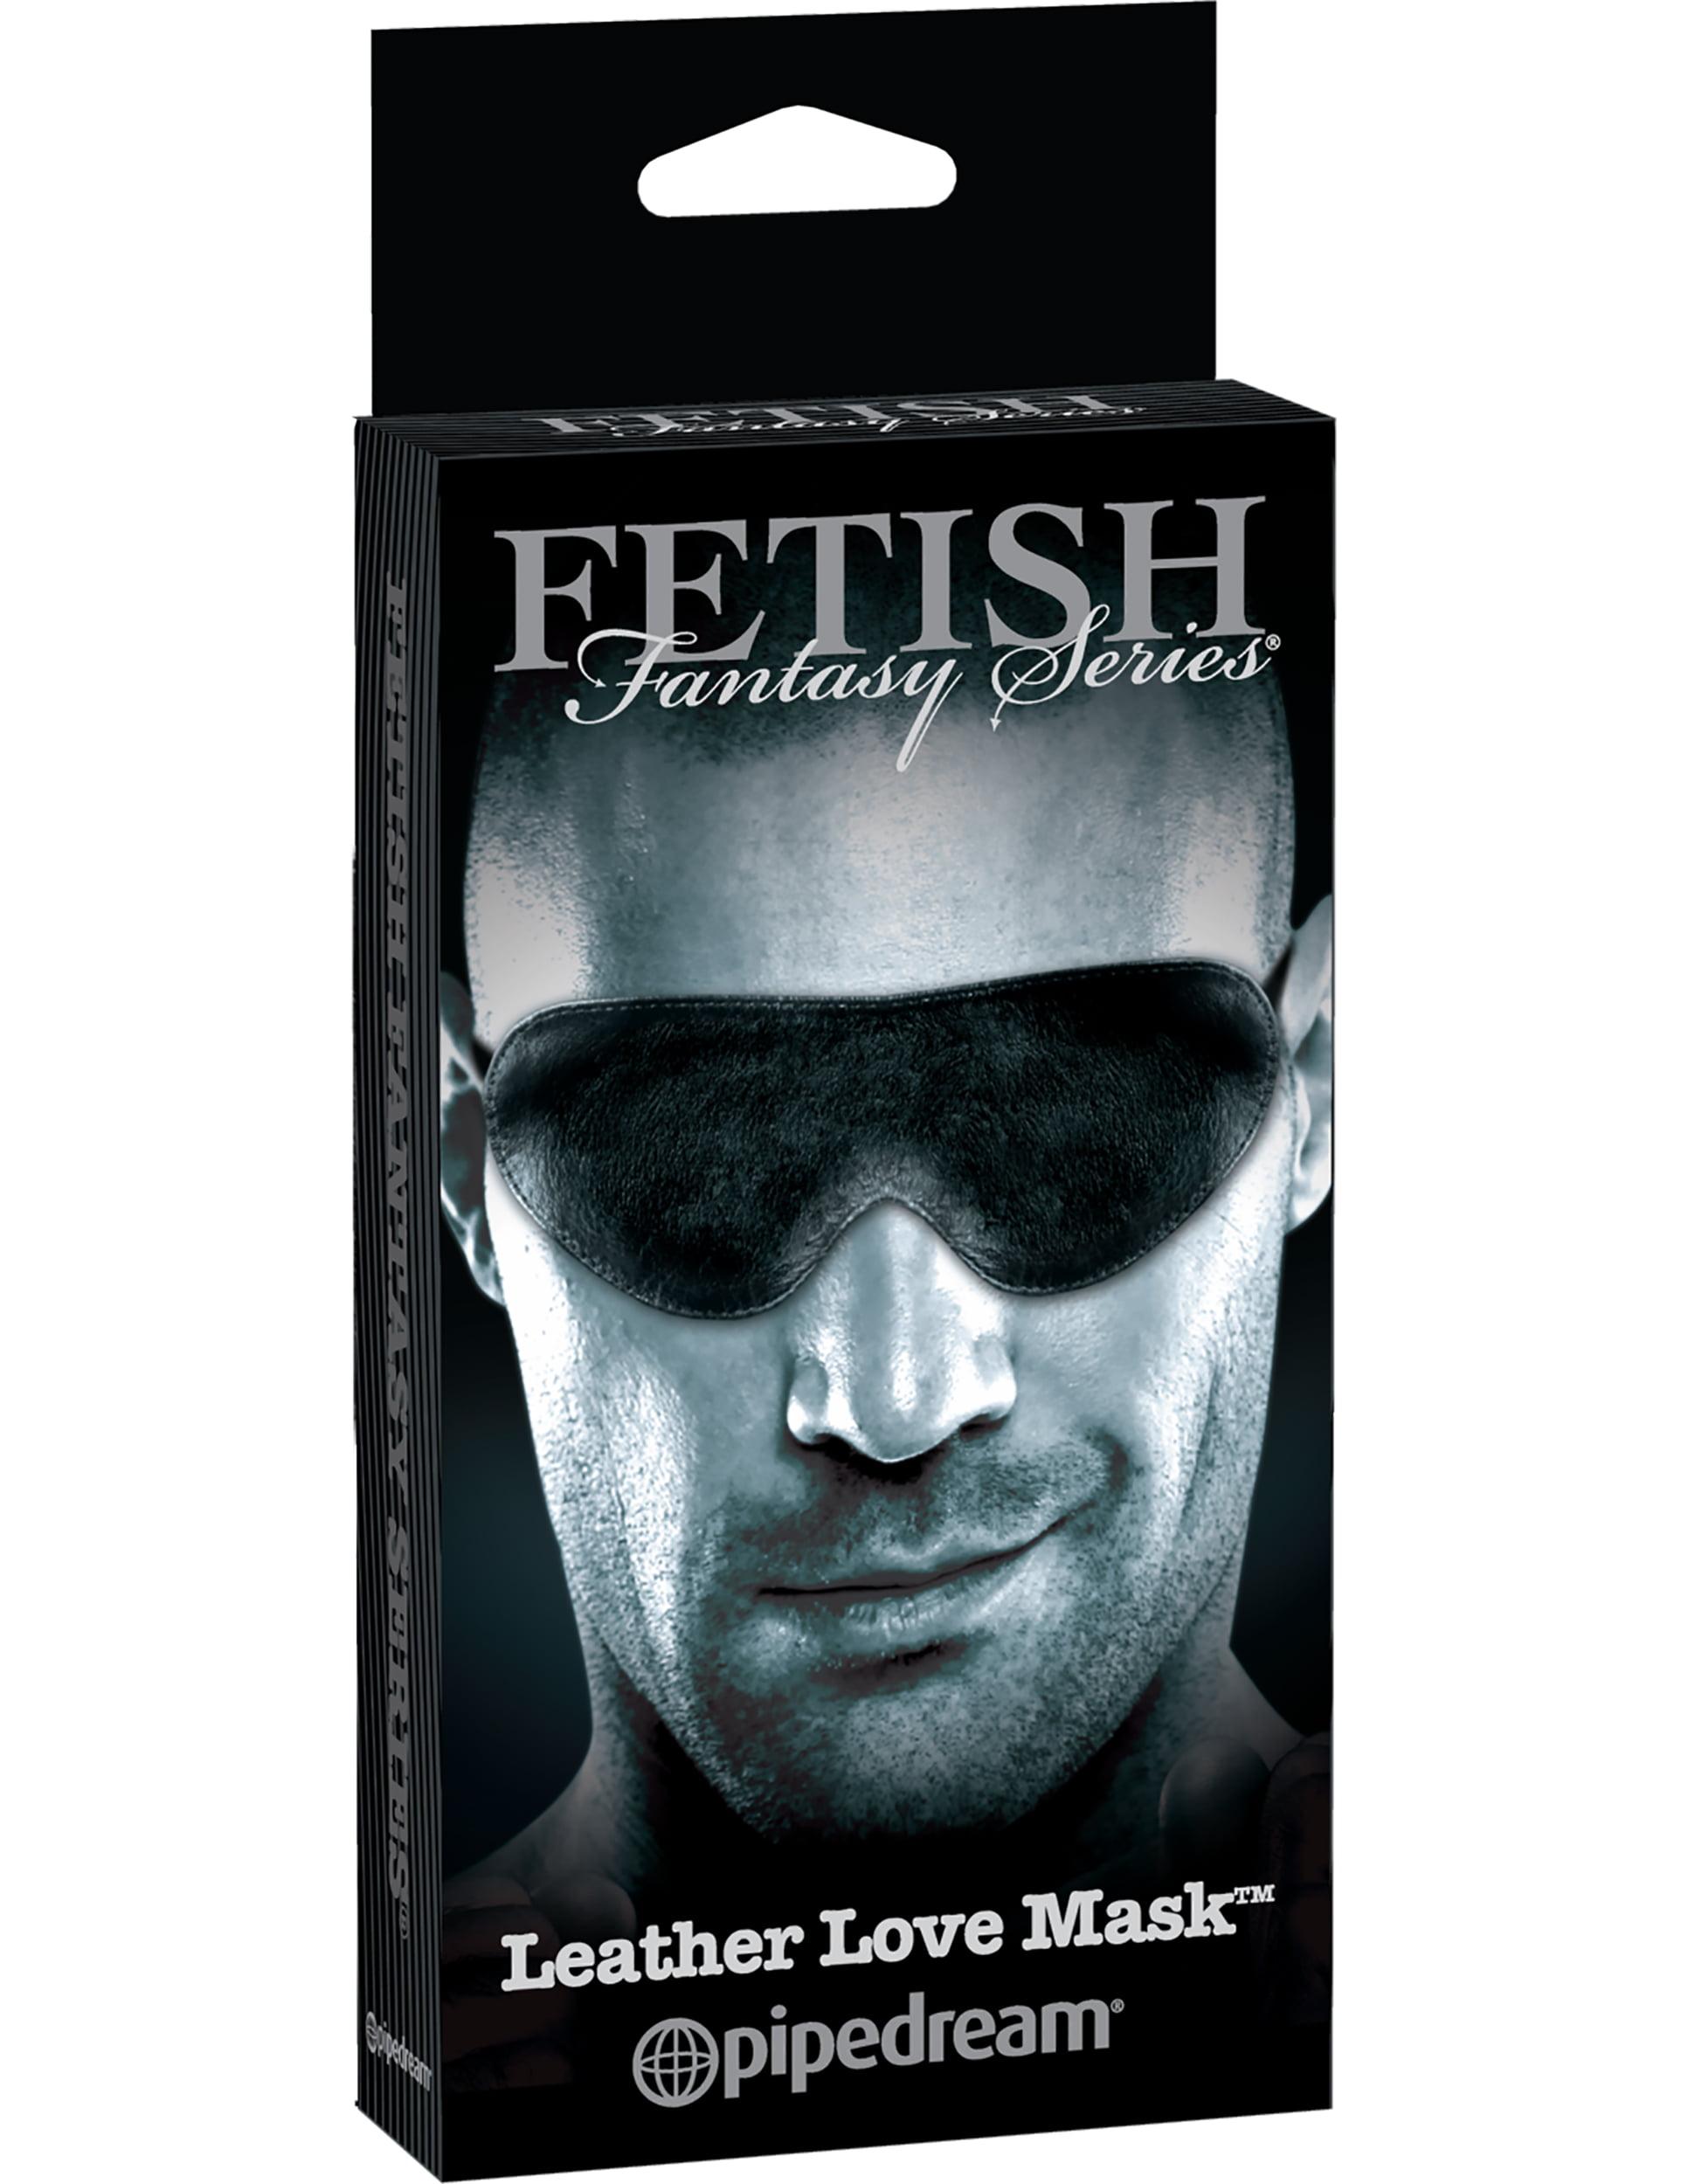 Venda em Pelúcia Leather Love Mask